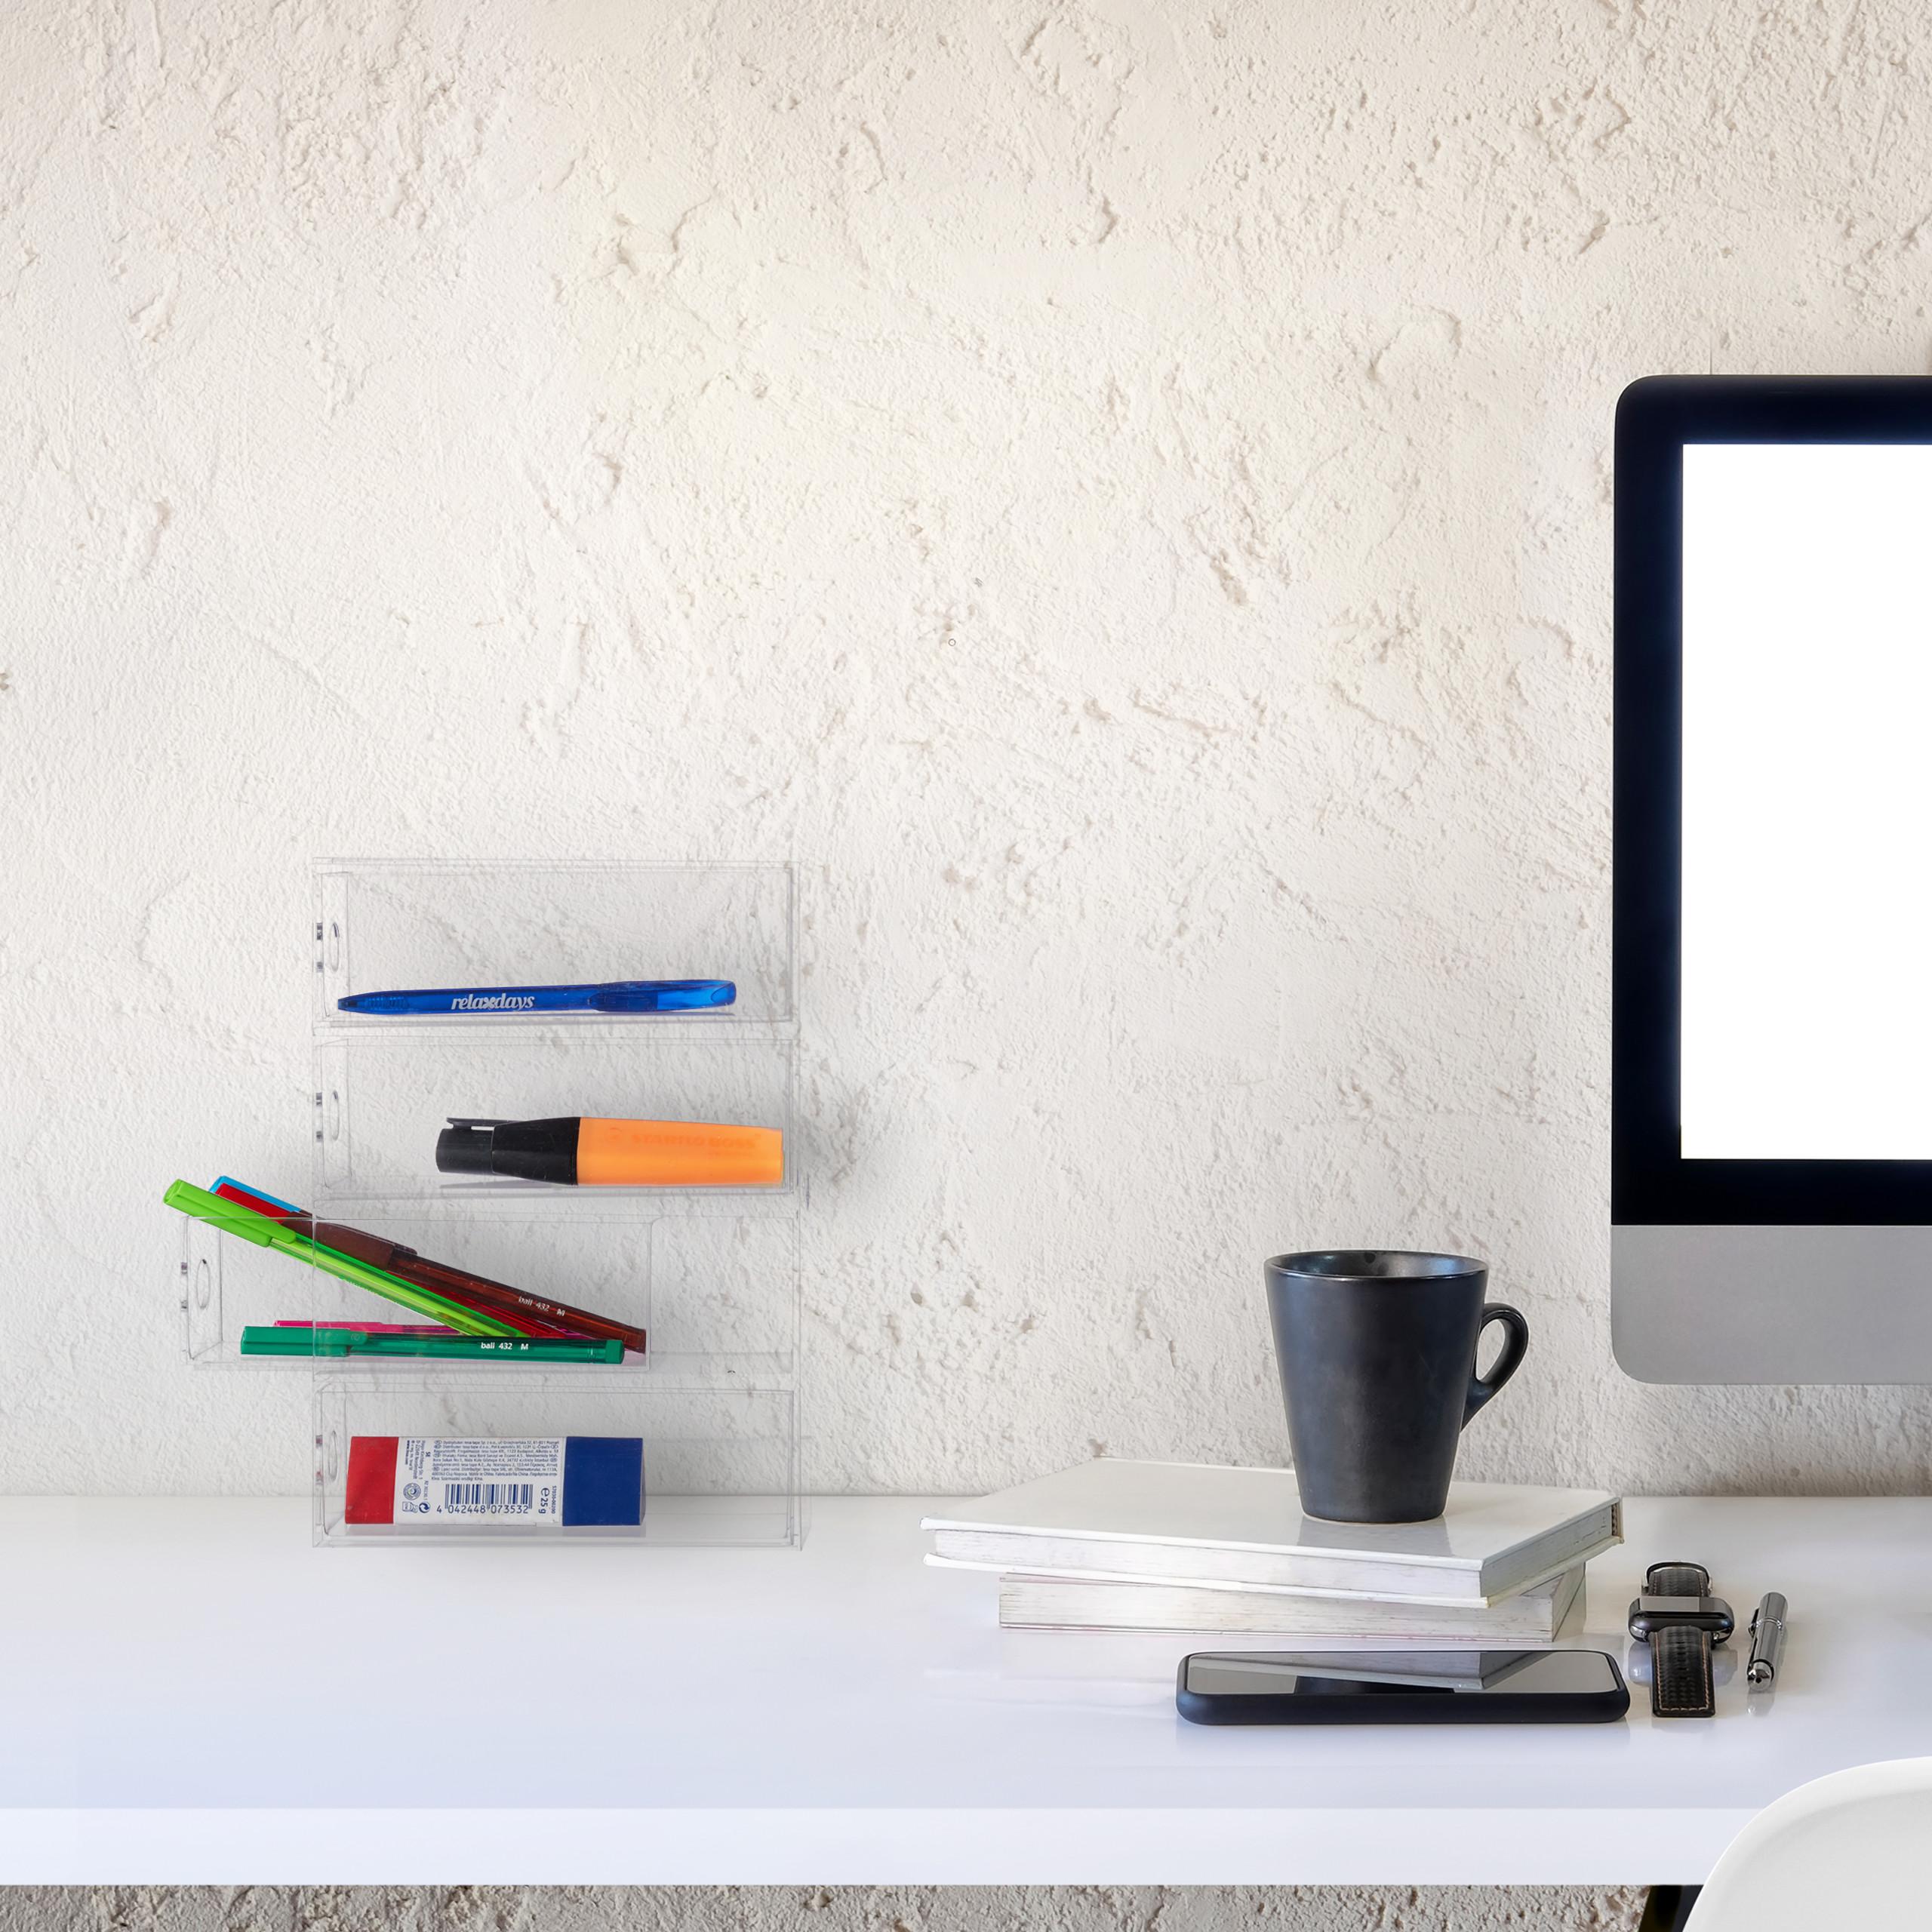 Transparent-Make-Up-Organiser-Storage-Box-with-4-Drawers thumbnail 4